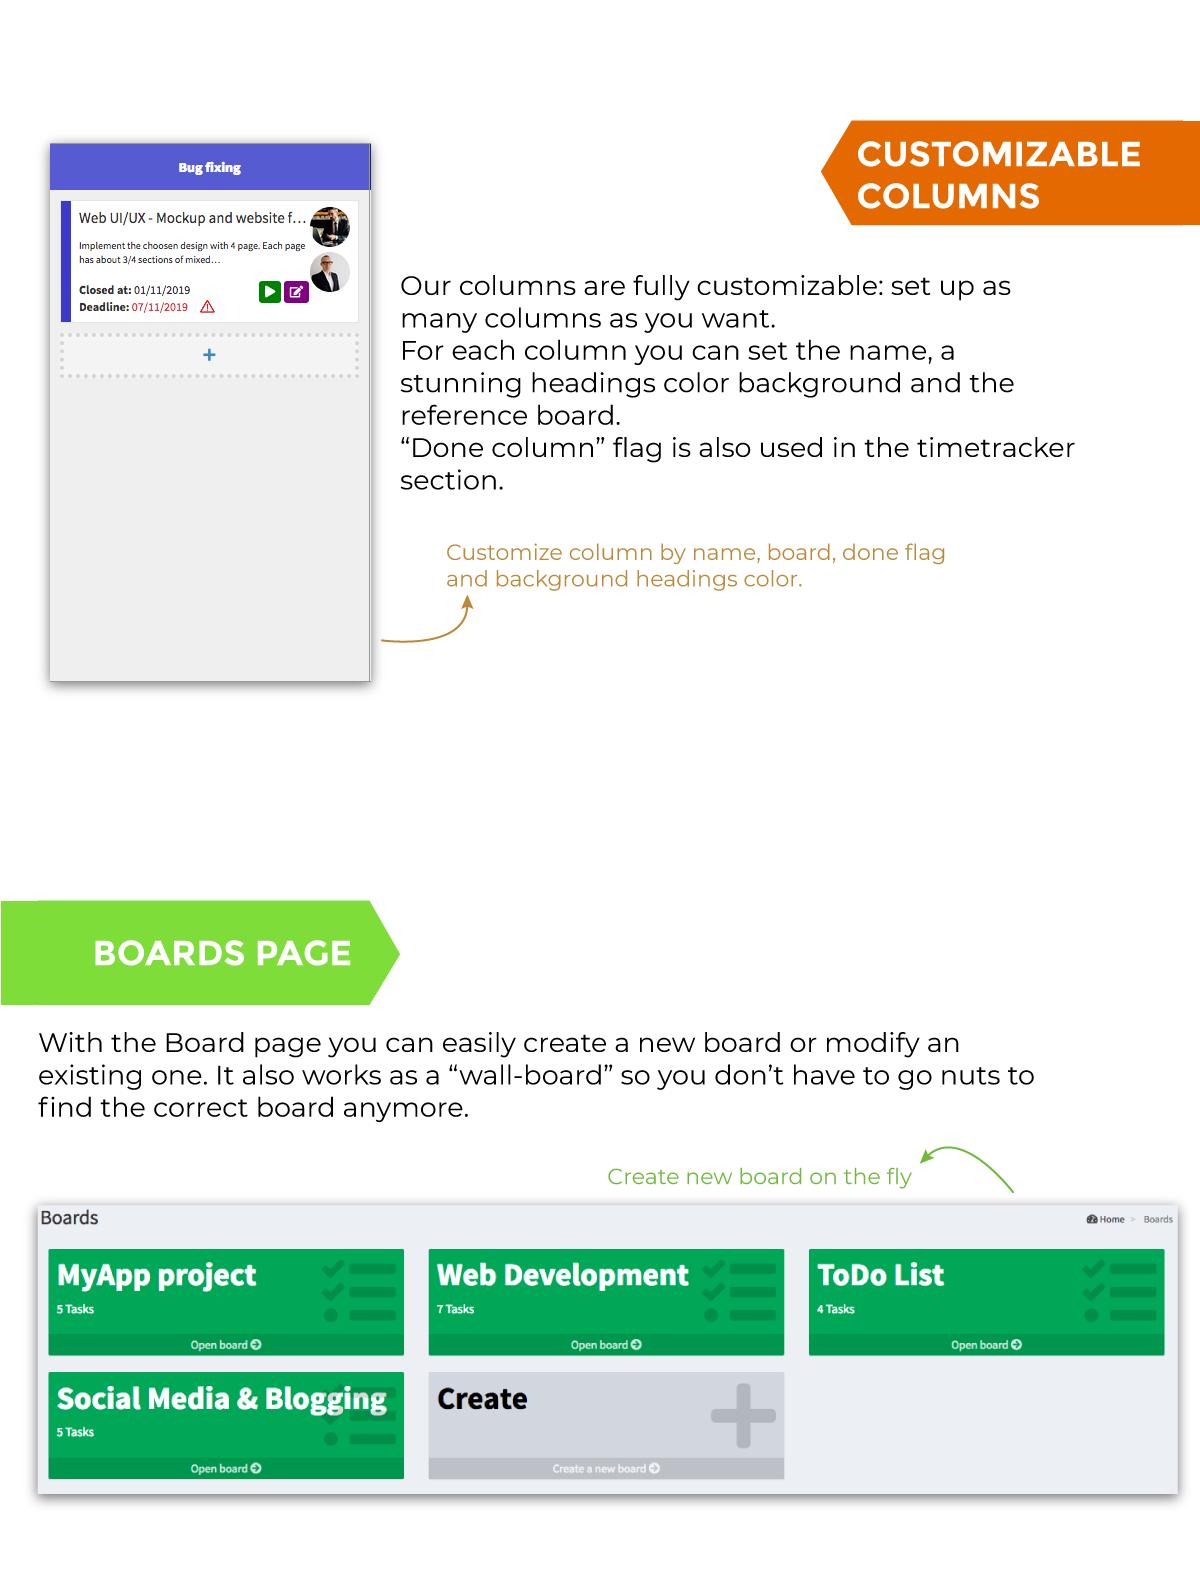 Personal Kanban Board - FireGUI Customizable - 3